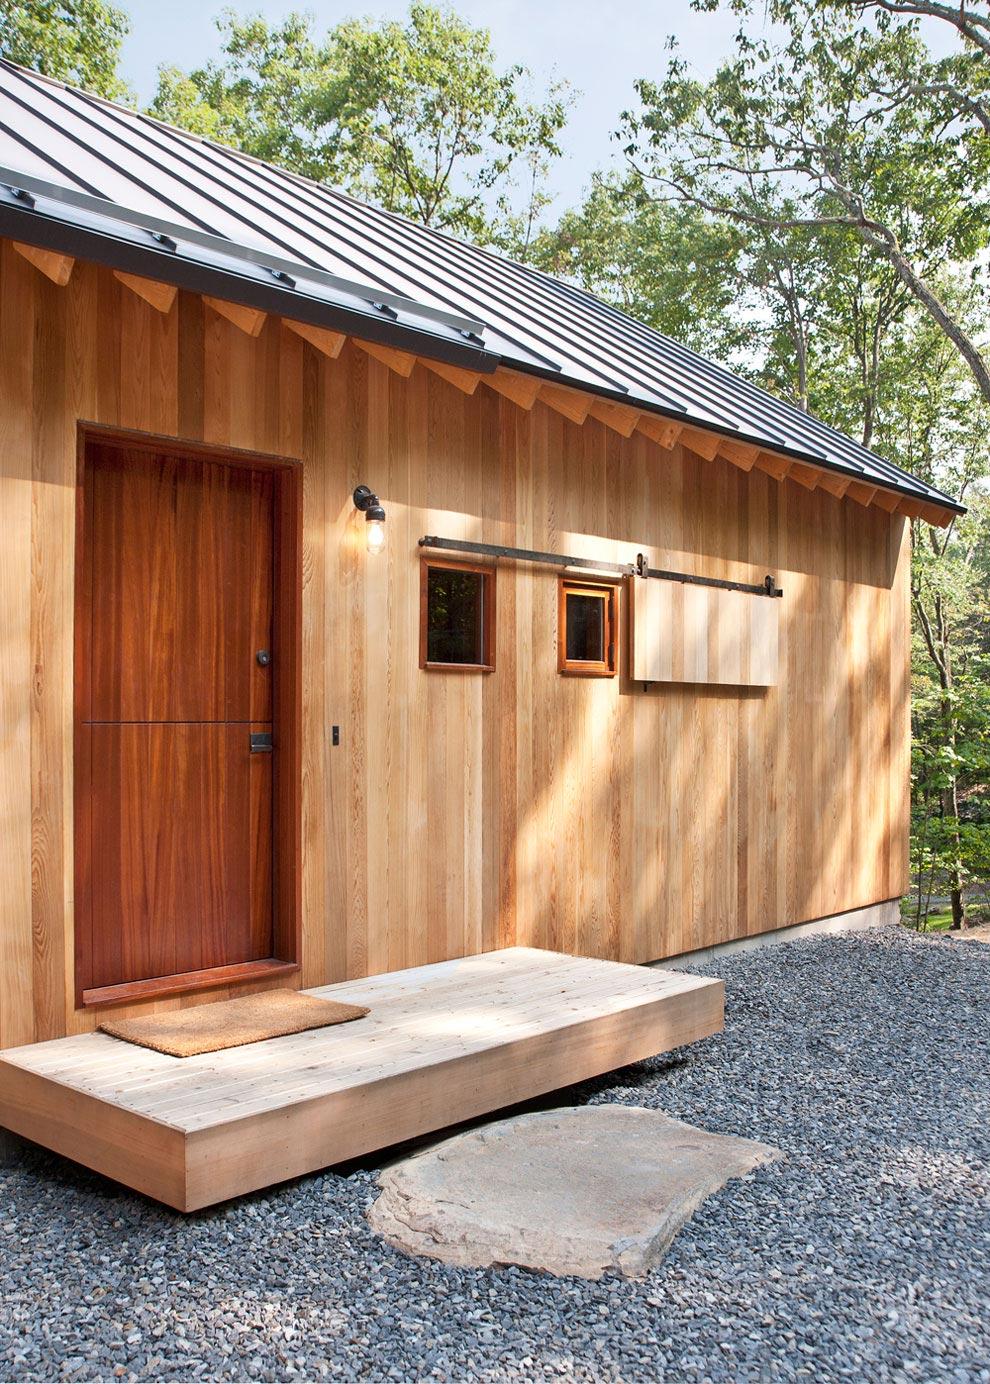 Front Door, Wood Sliding Shutter, Wood and Glass House in Kerhonkson